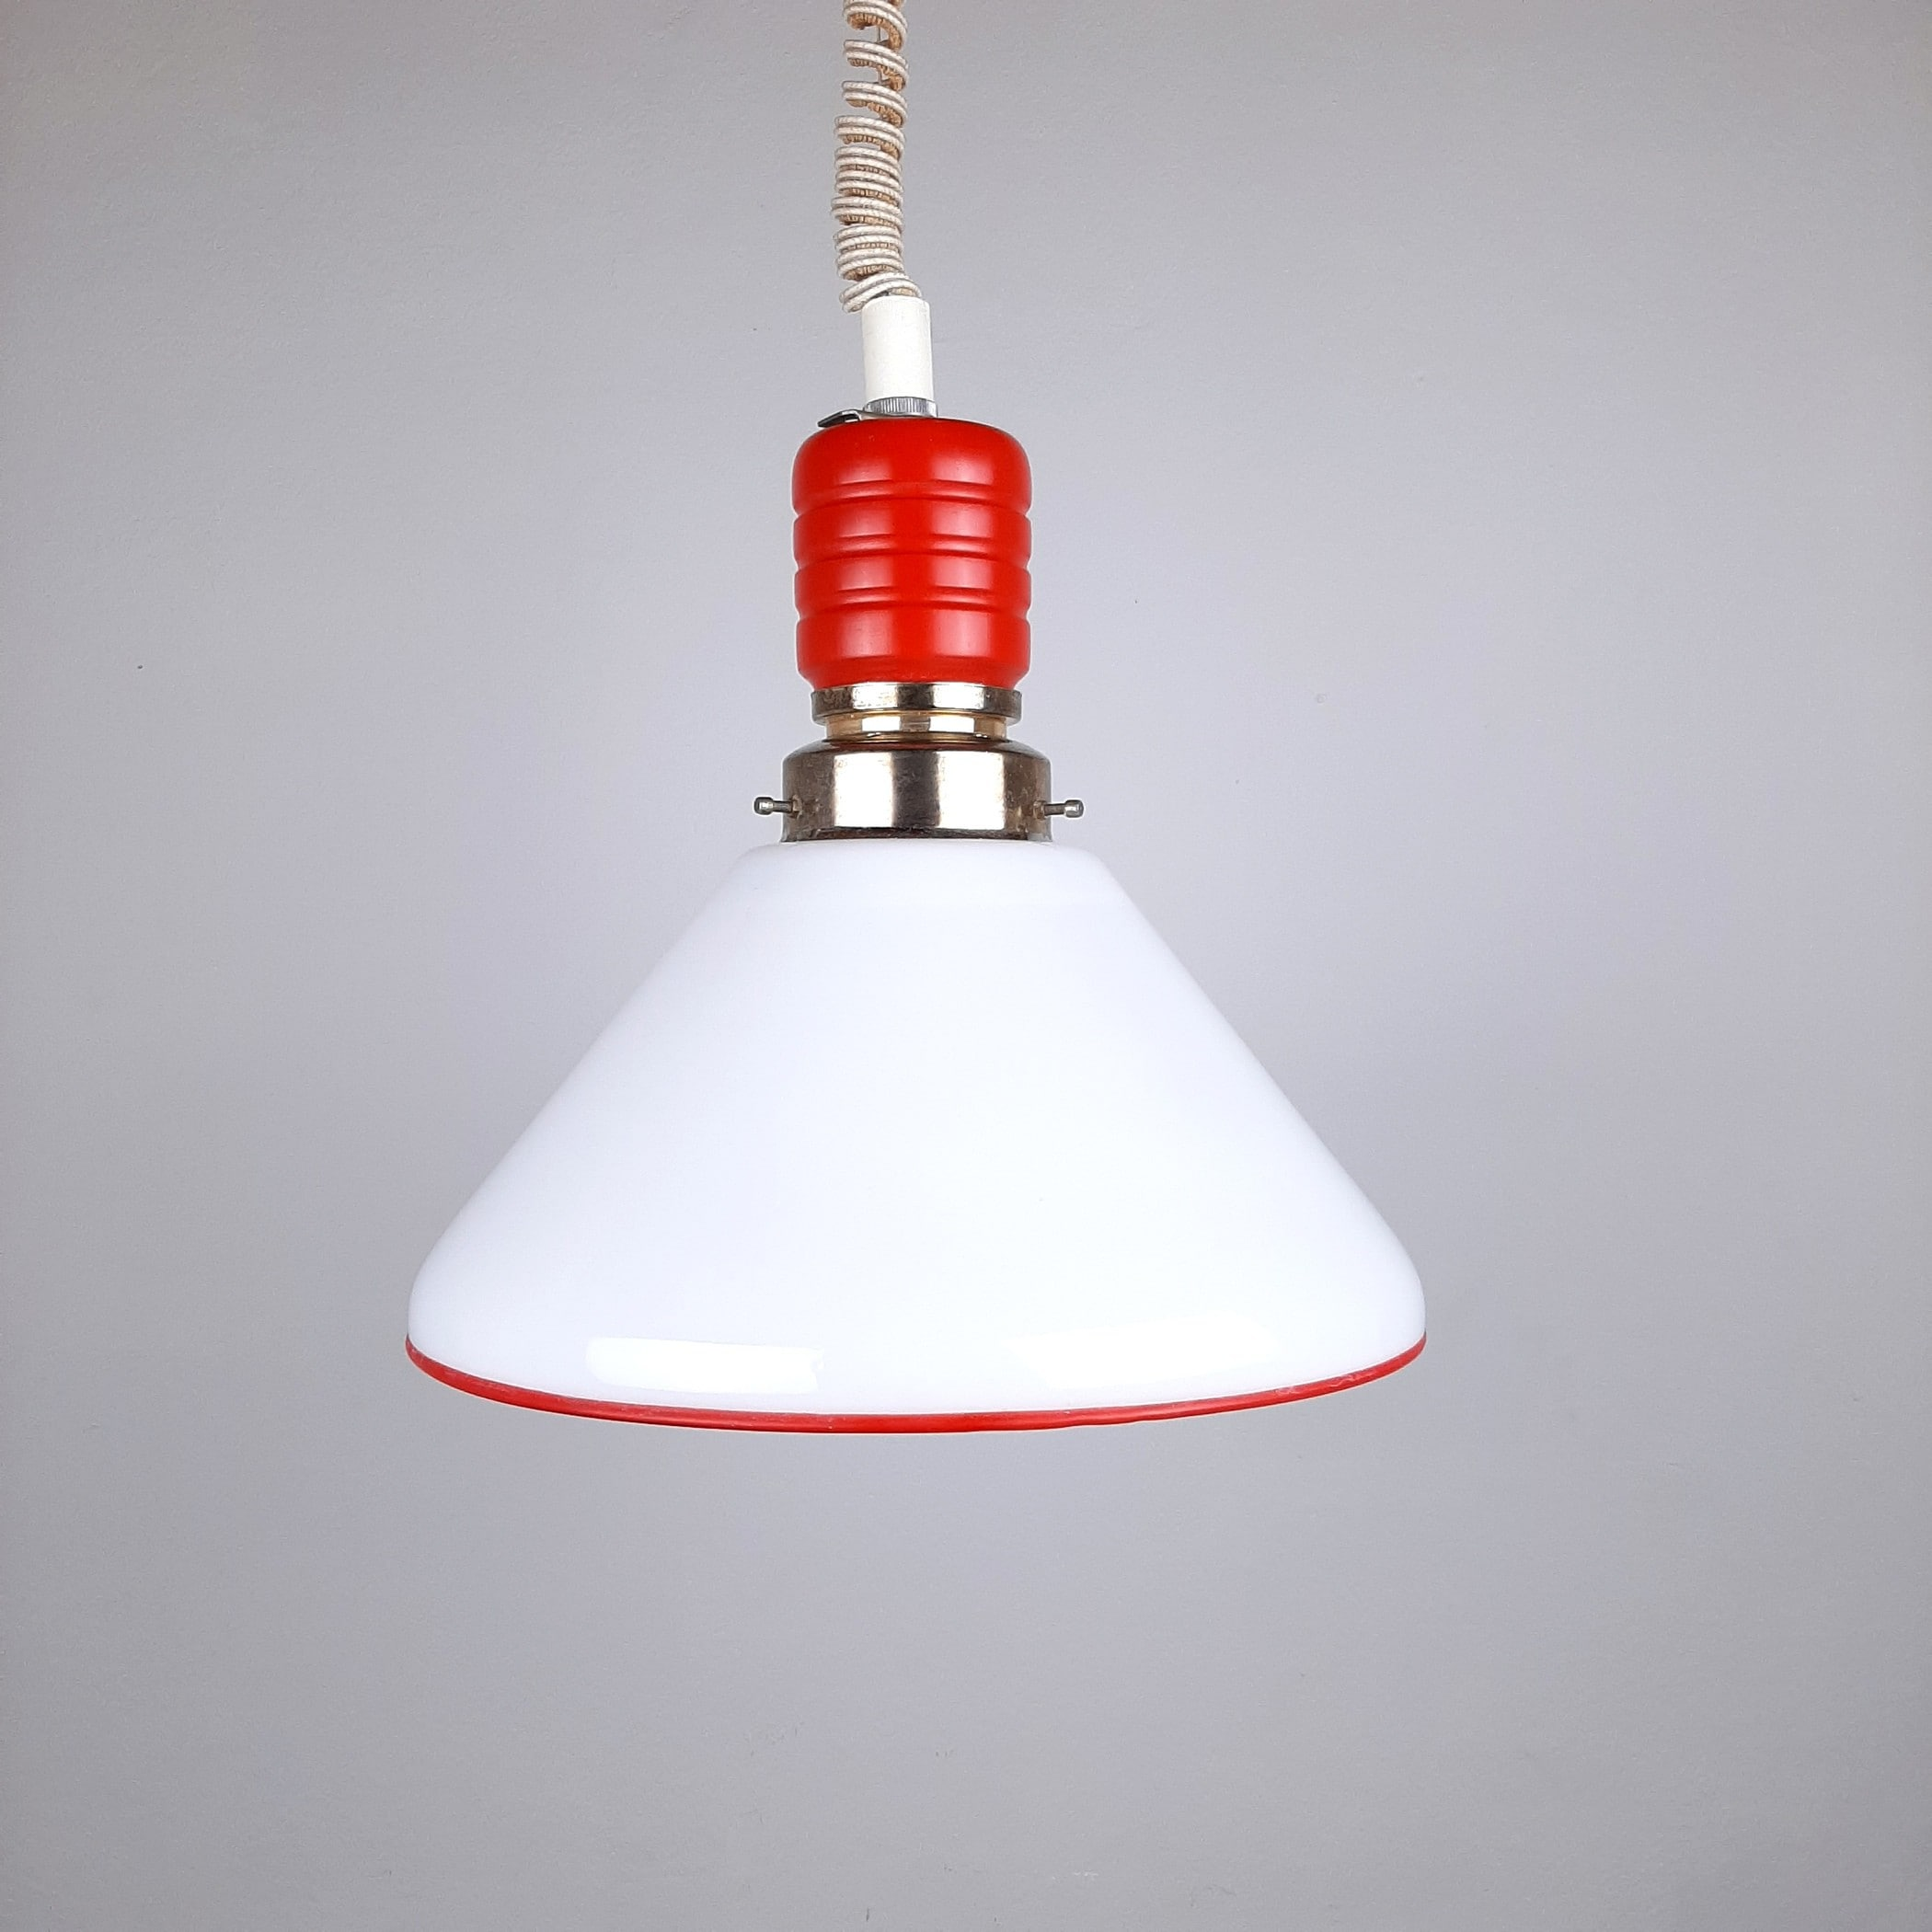 Retro pendant lamp Italy 70s Glass Wood Red&White Farmhouse Cottage MCM Vintage lighting Retro Home Decor